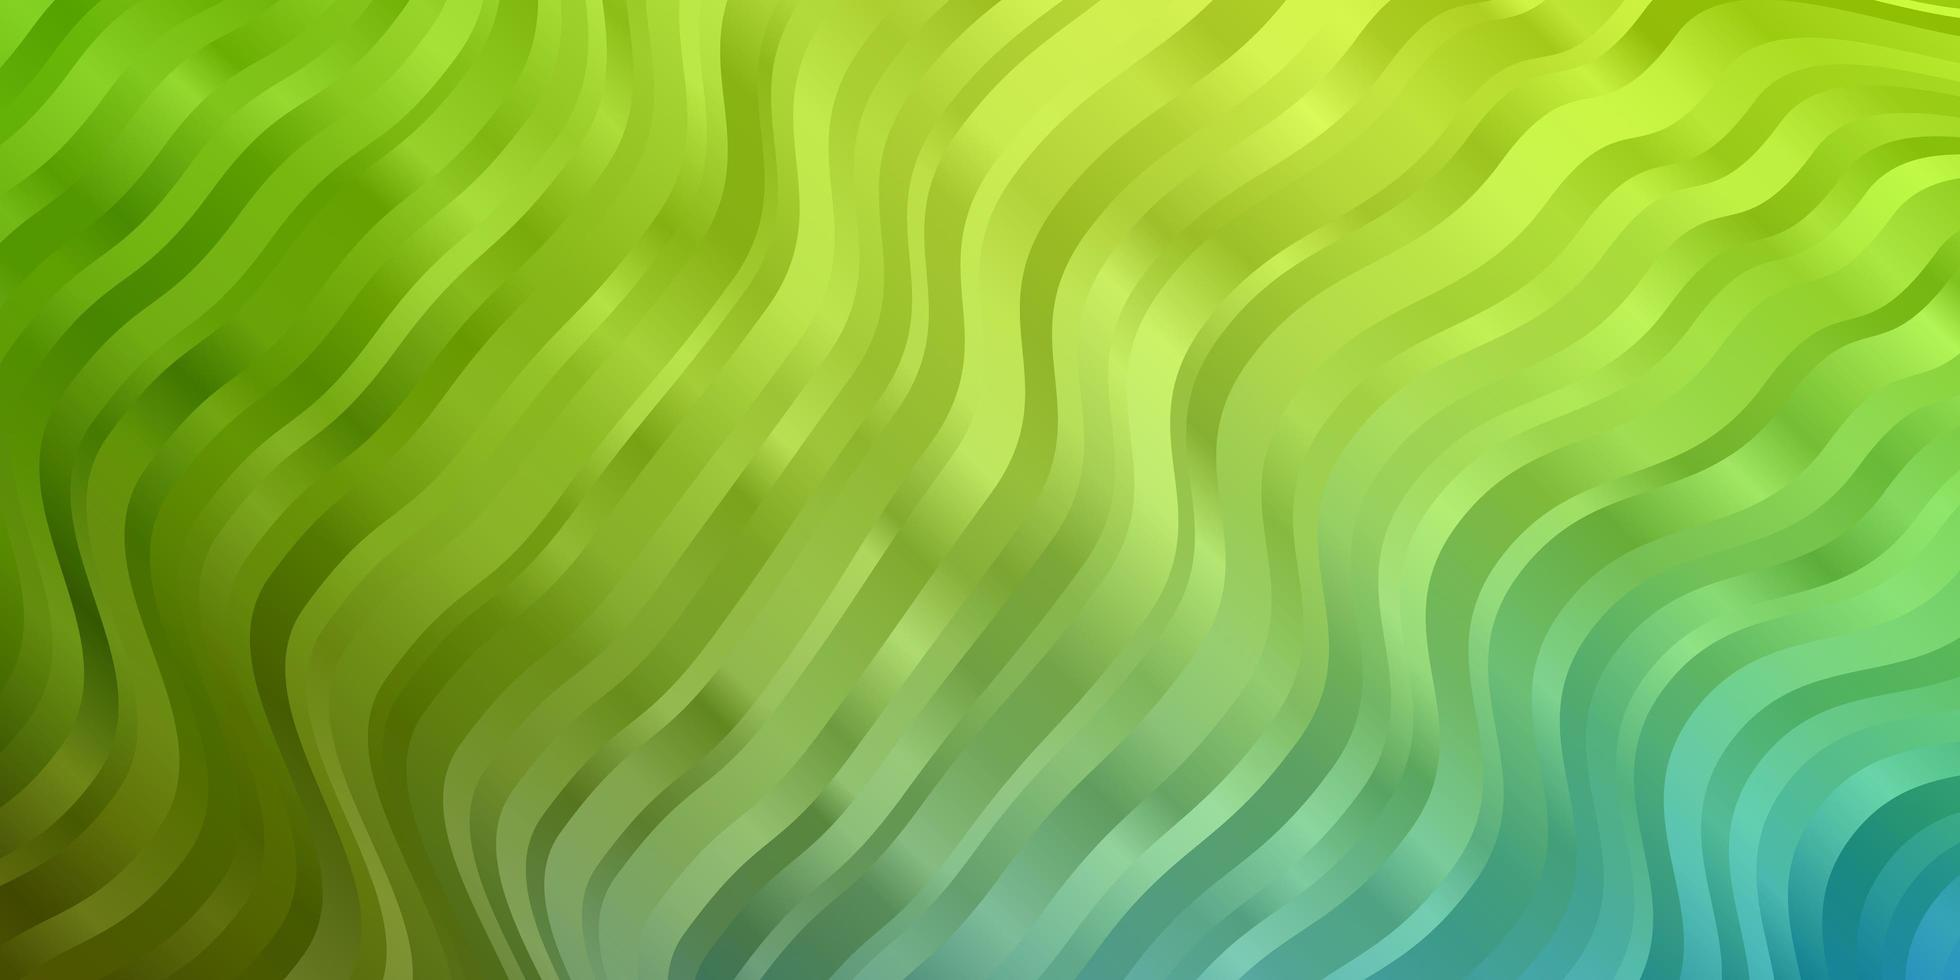 fond bleu et vert avec des courbes. vecteur